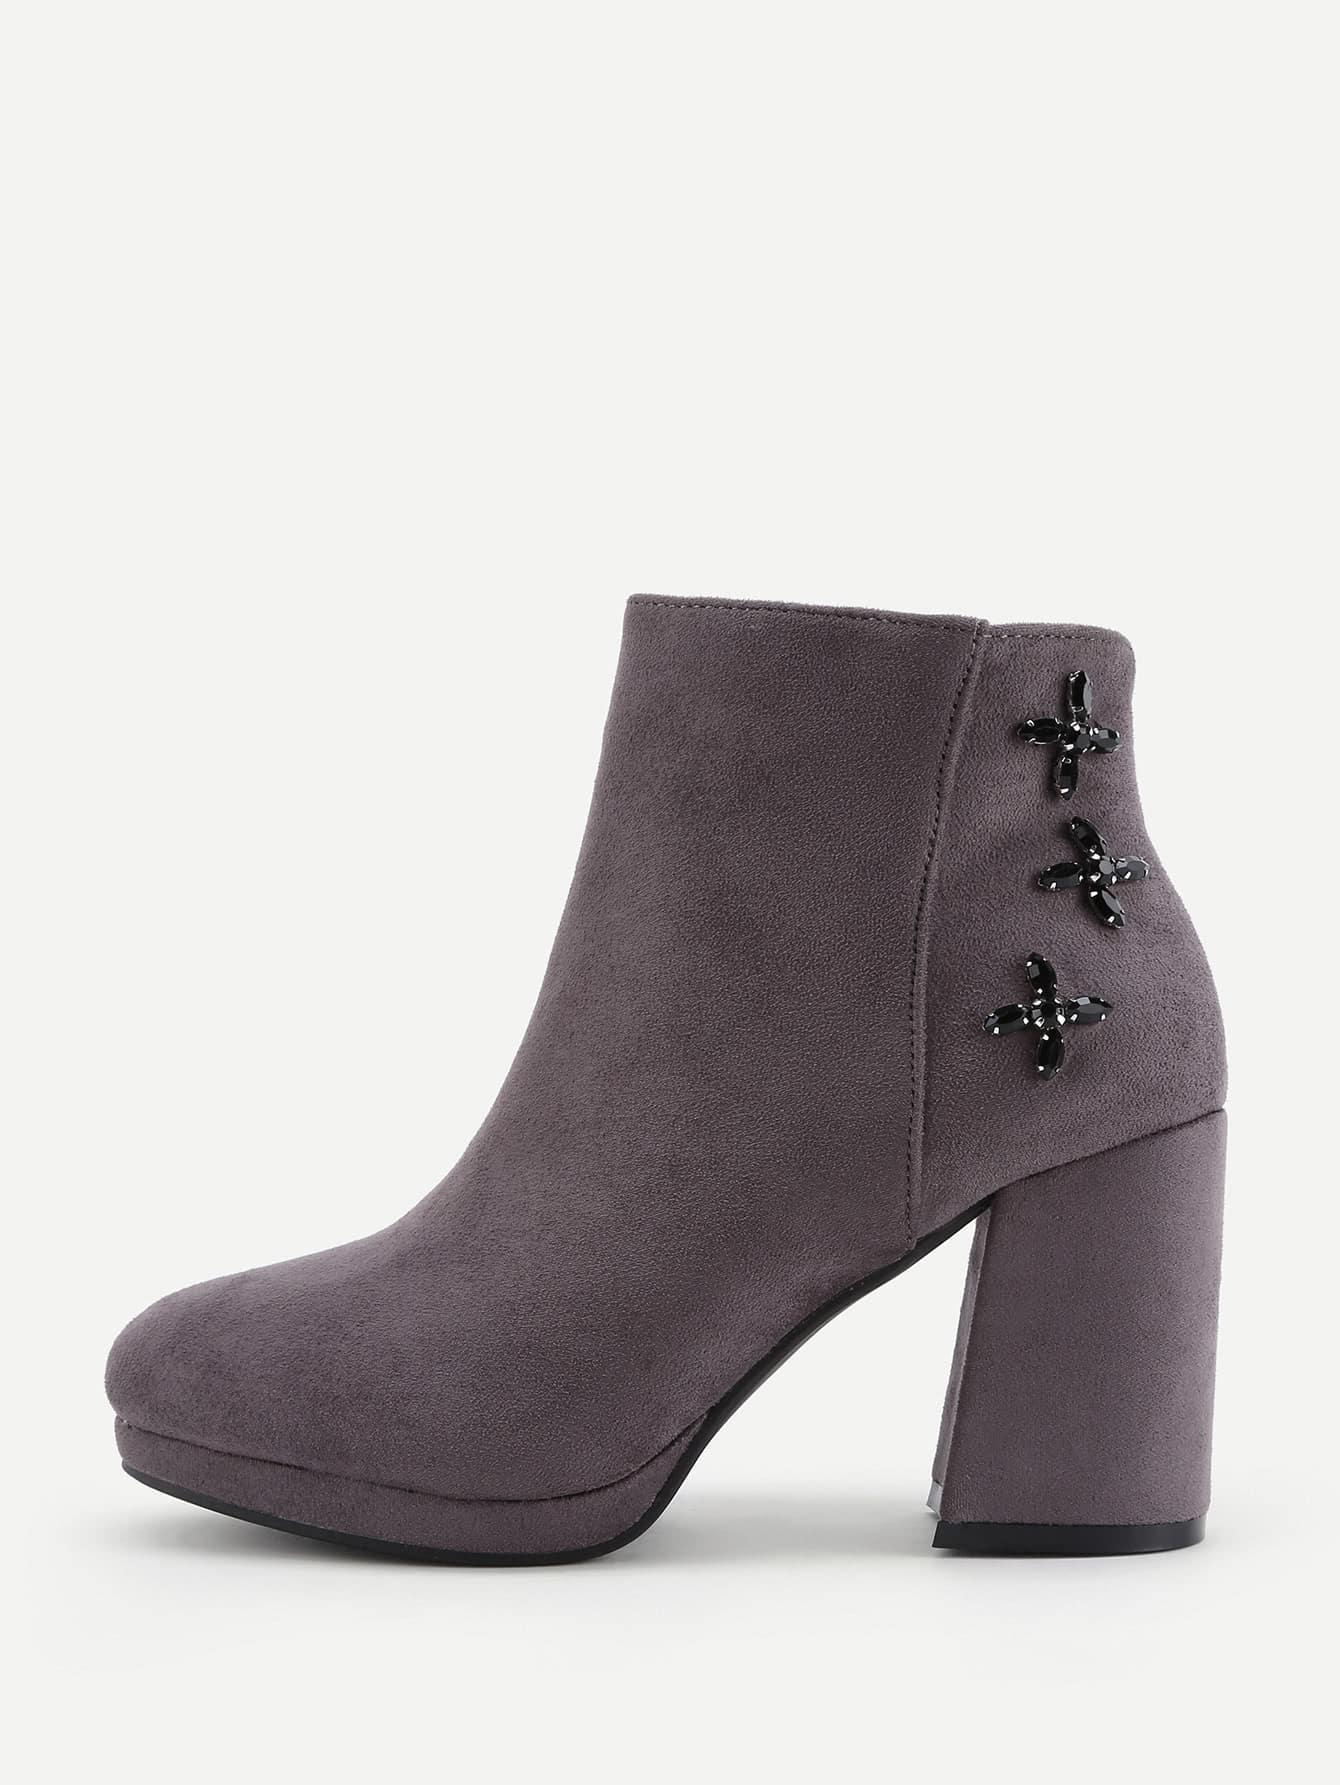 Rhinestone Flower High Heeled Ankle Boots